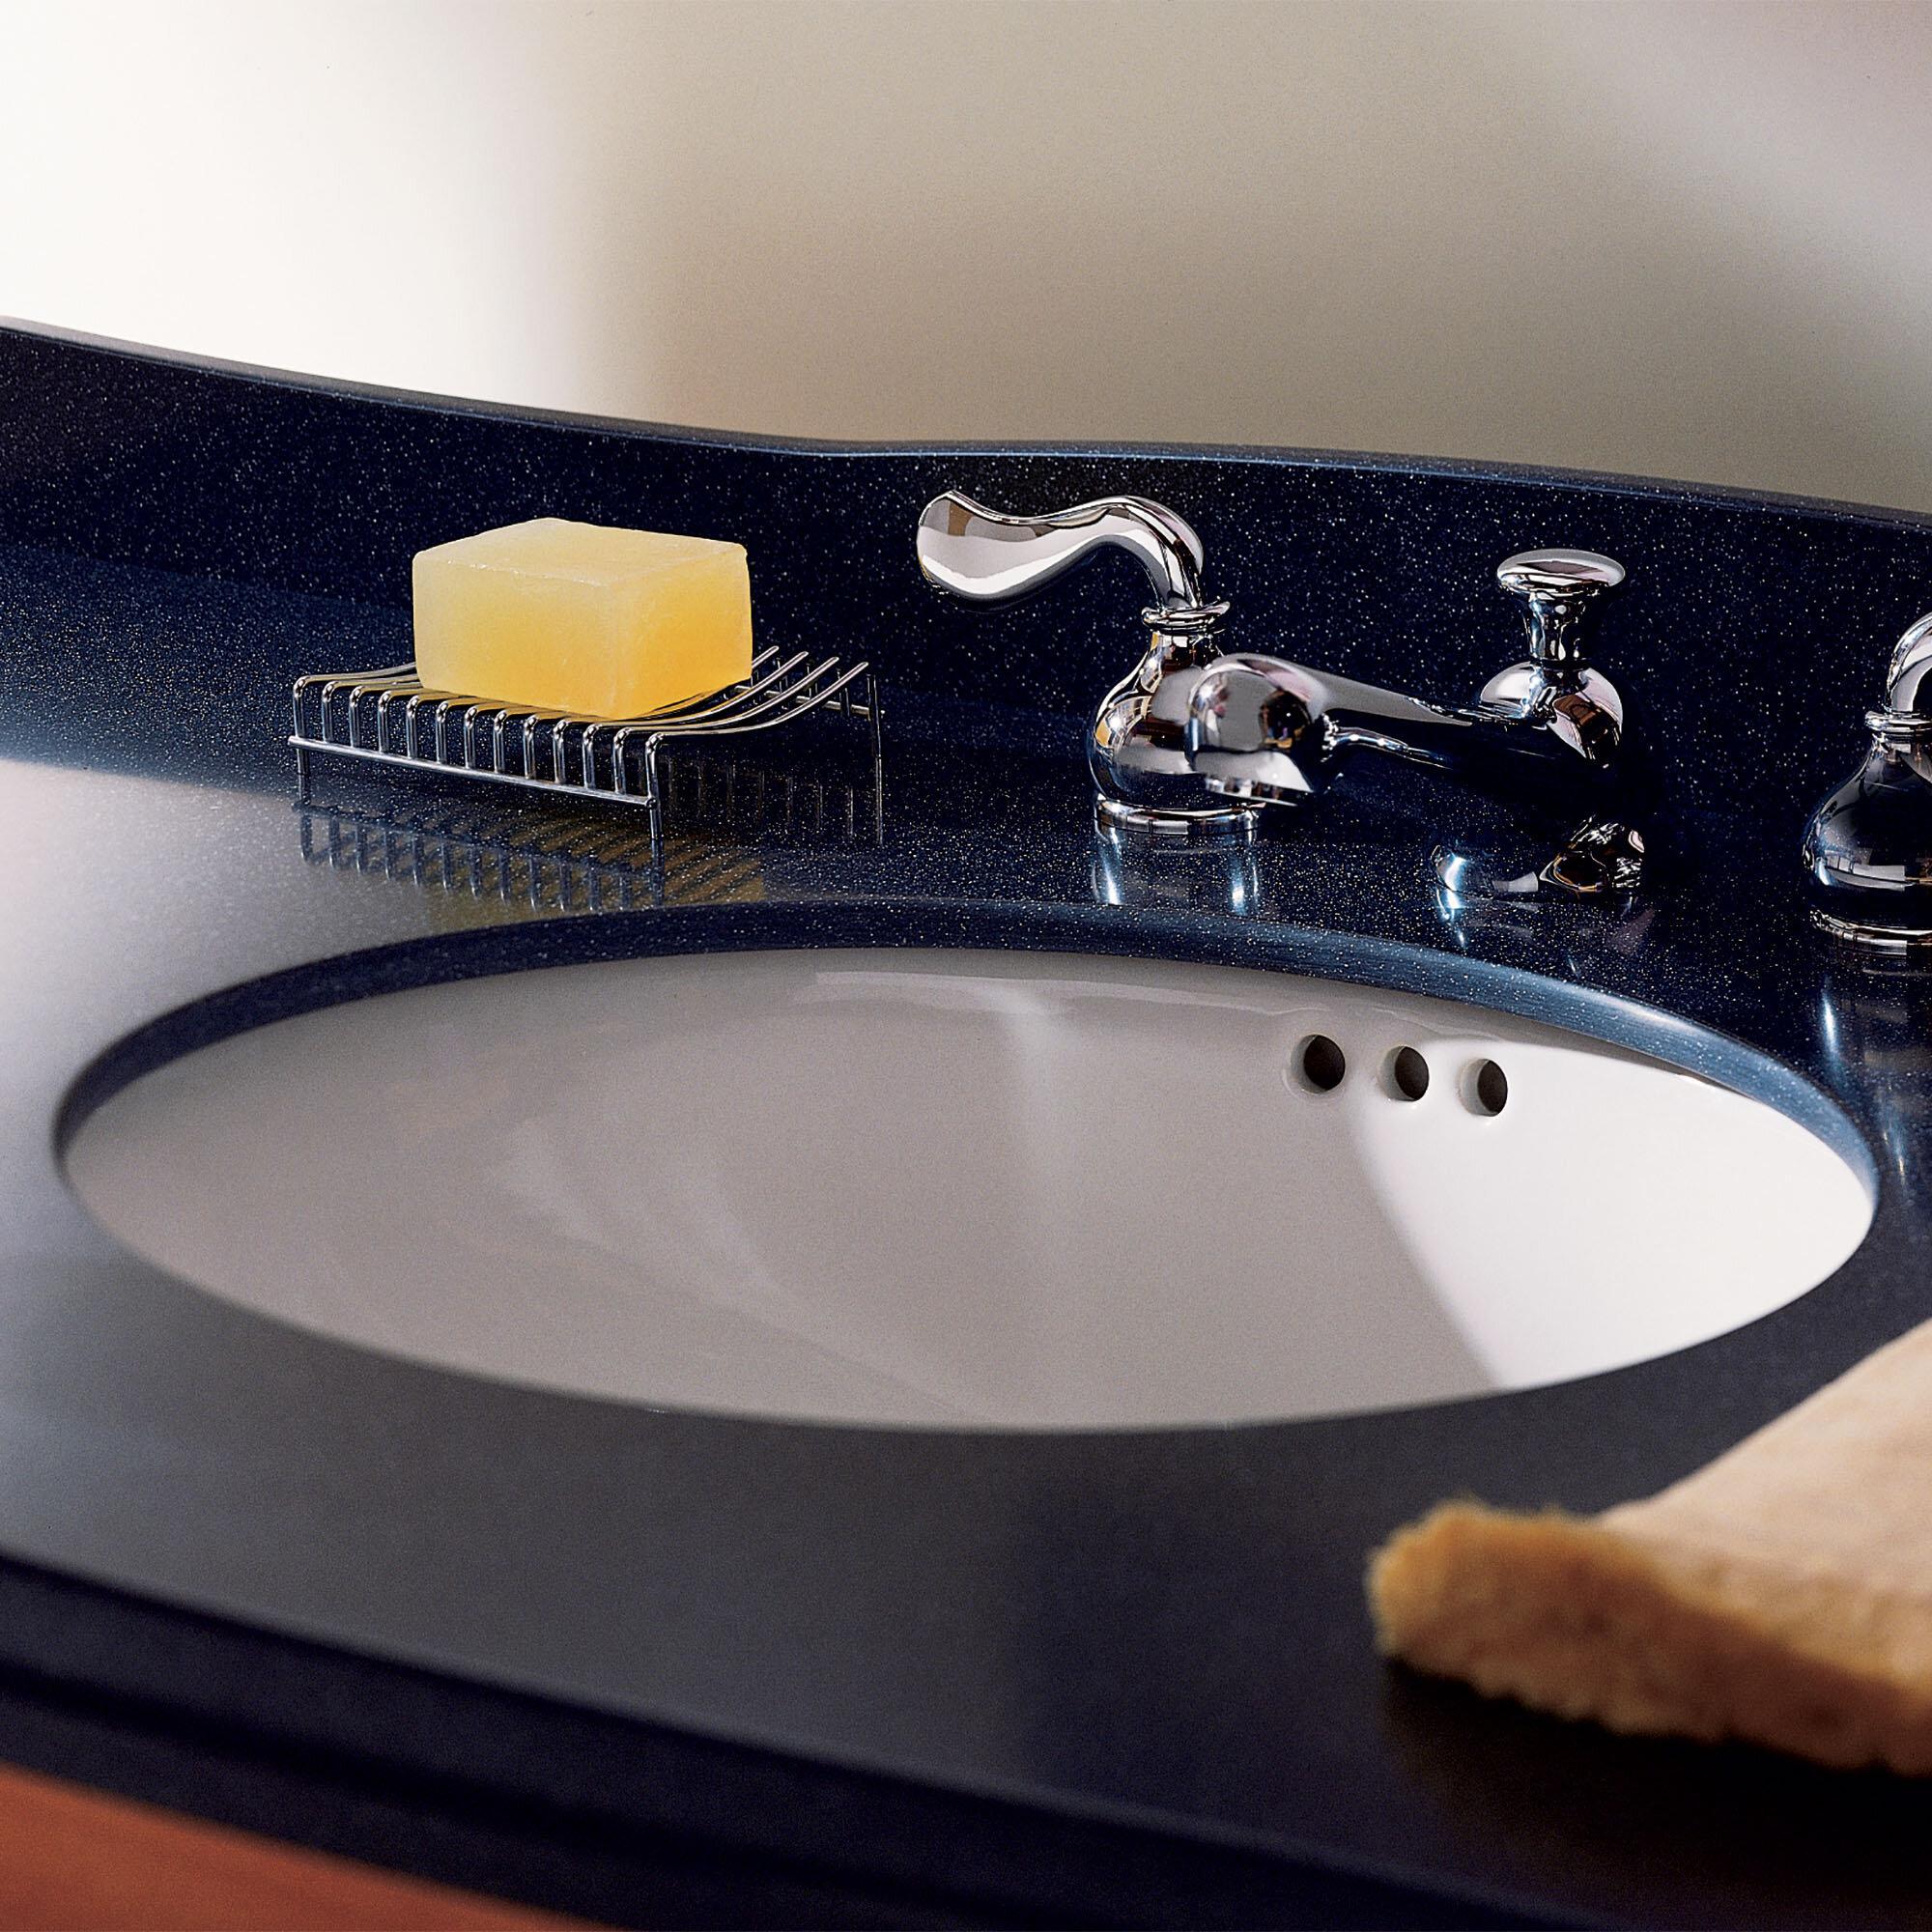 Incroyable Ovalyn Ceramic Oval Undermount Bathroom Sink With Overflow